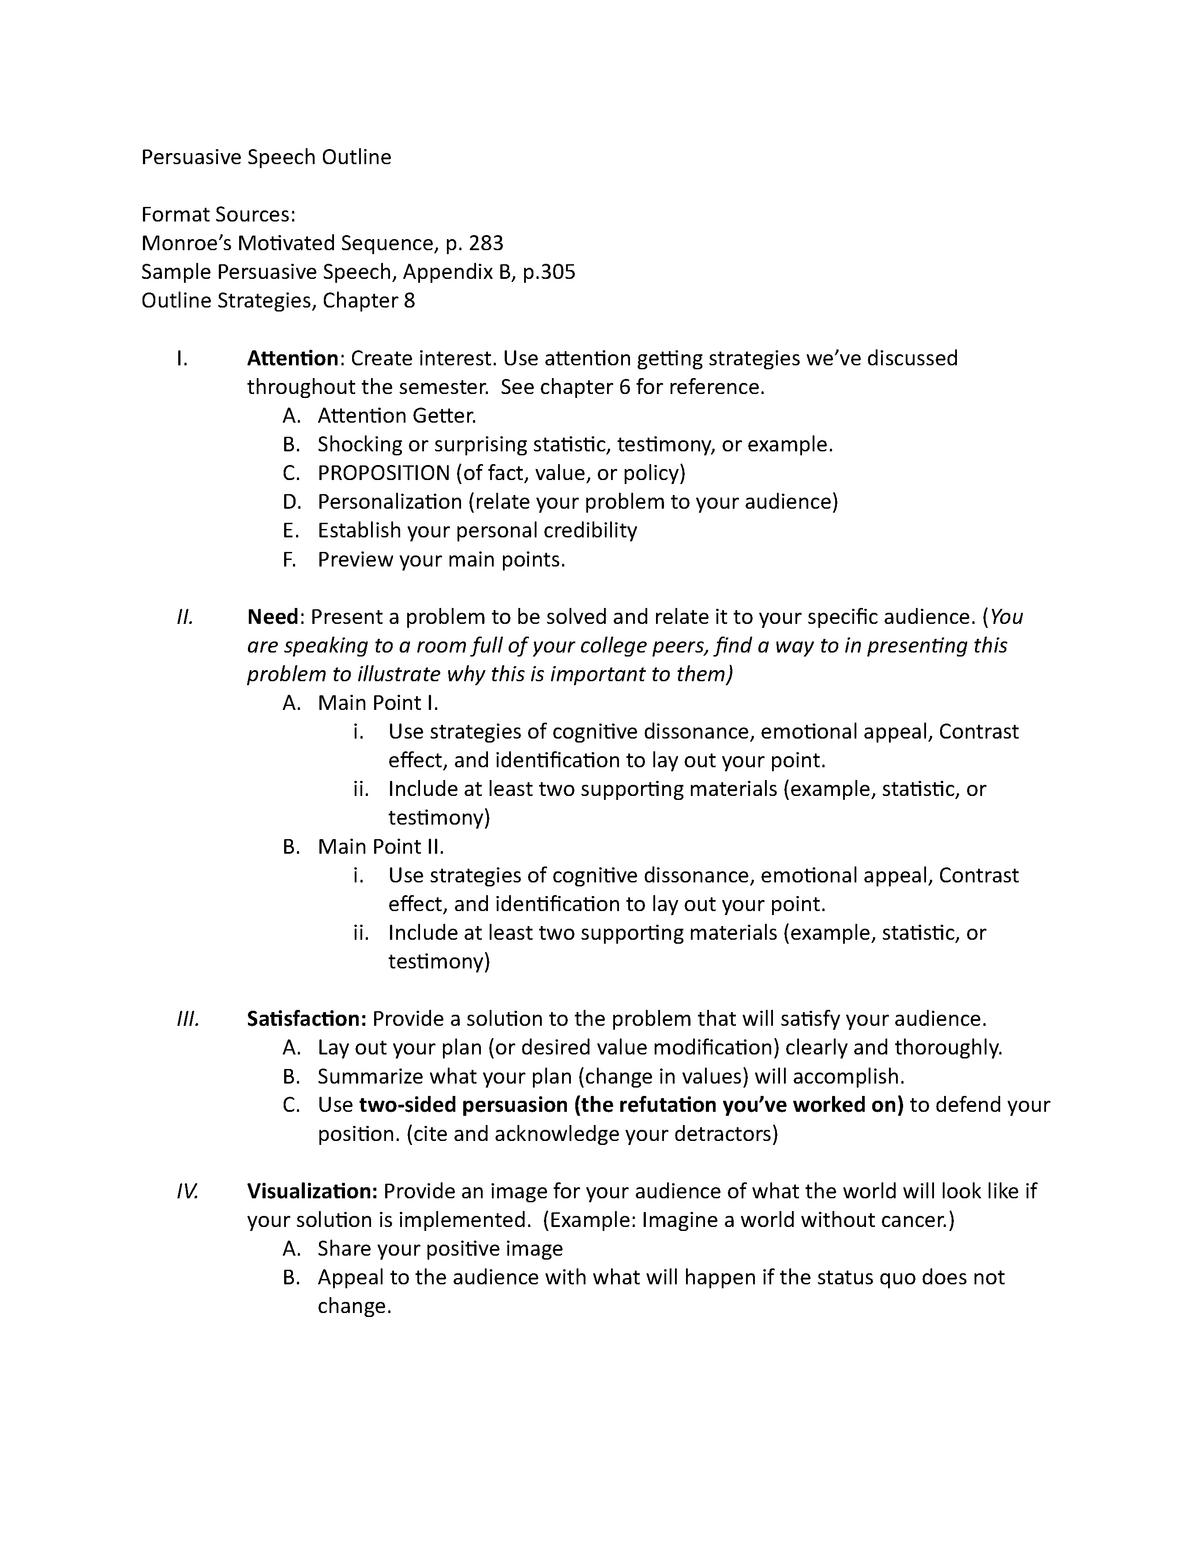 Example outline persuasive speech 4+ Persuasive